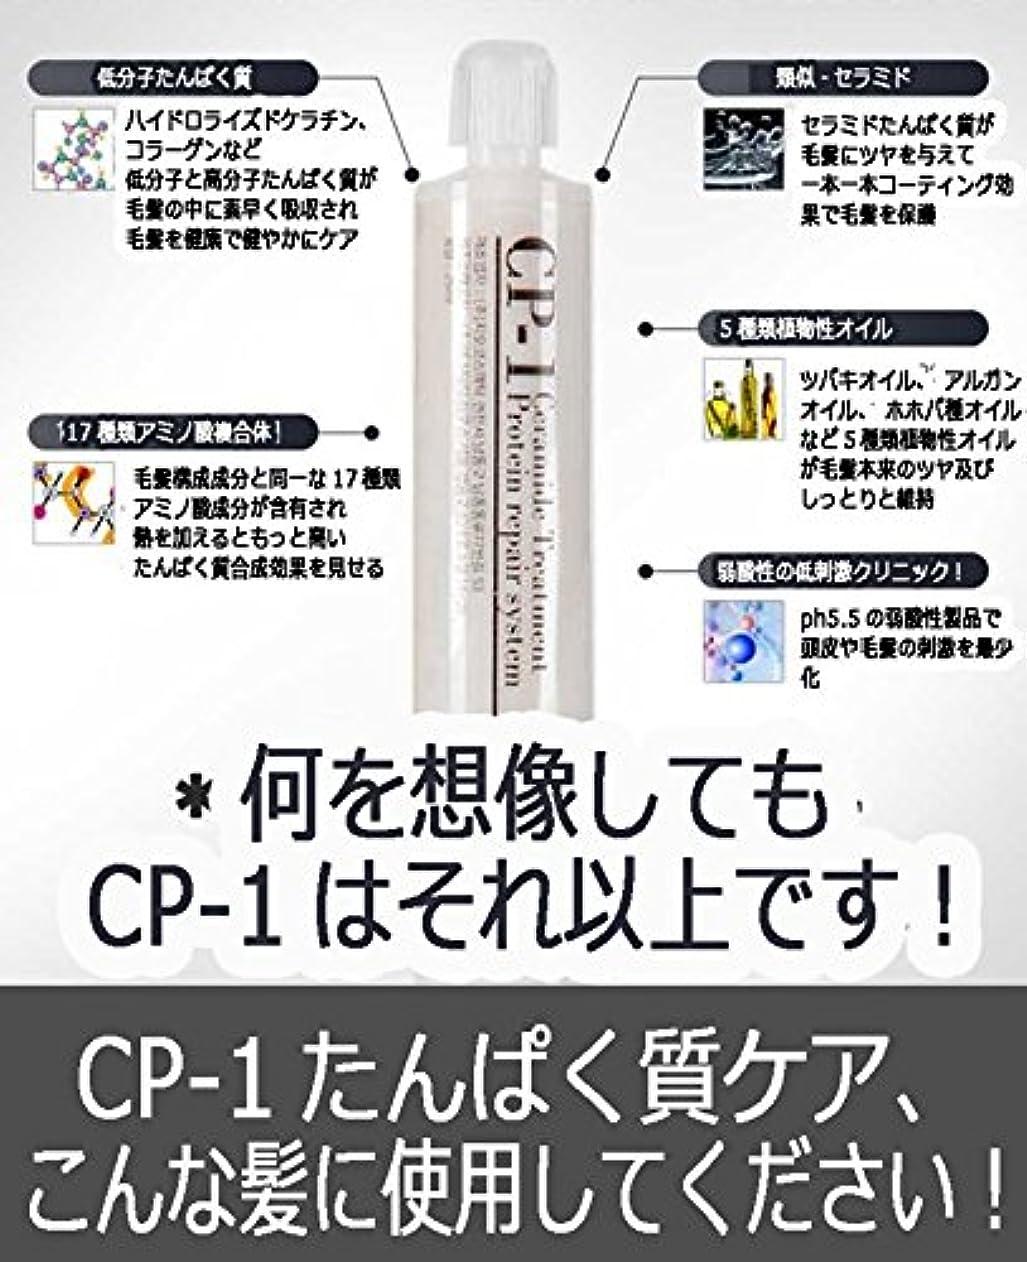 [CP-1 Protein 10pcs タンパク質&セラミド] ヘア?デザイナーが先ずお勧めするタンパク質クリニック!家で簡単タンパク質の施術で、高度なサロンケアを体験!【10個入り】